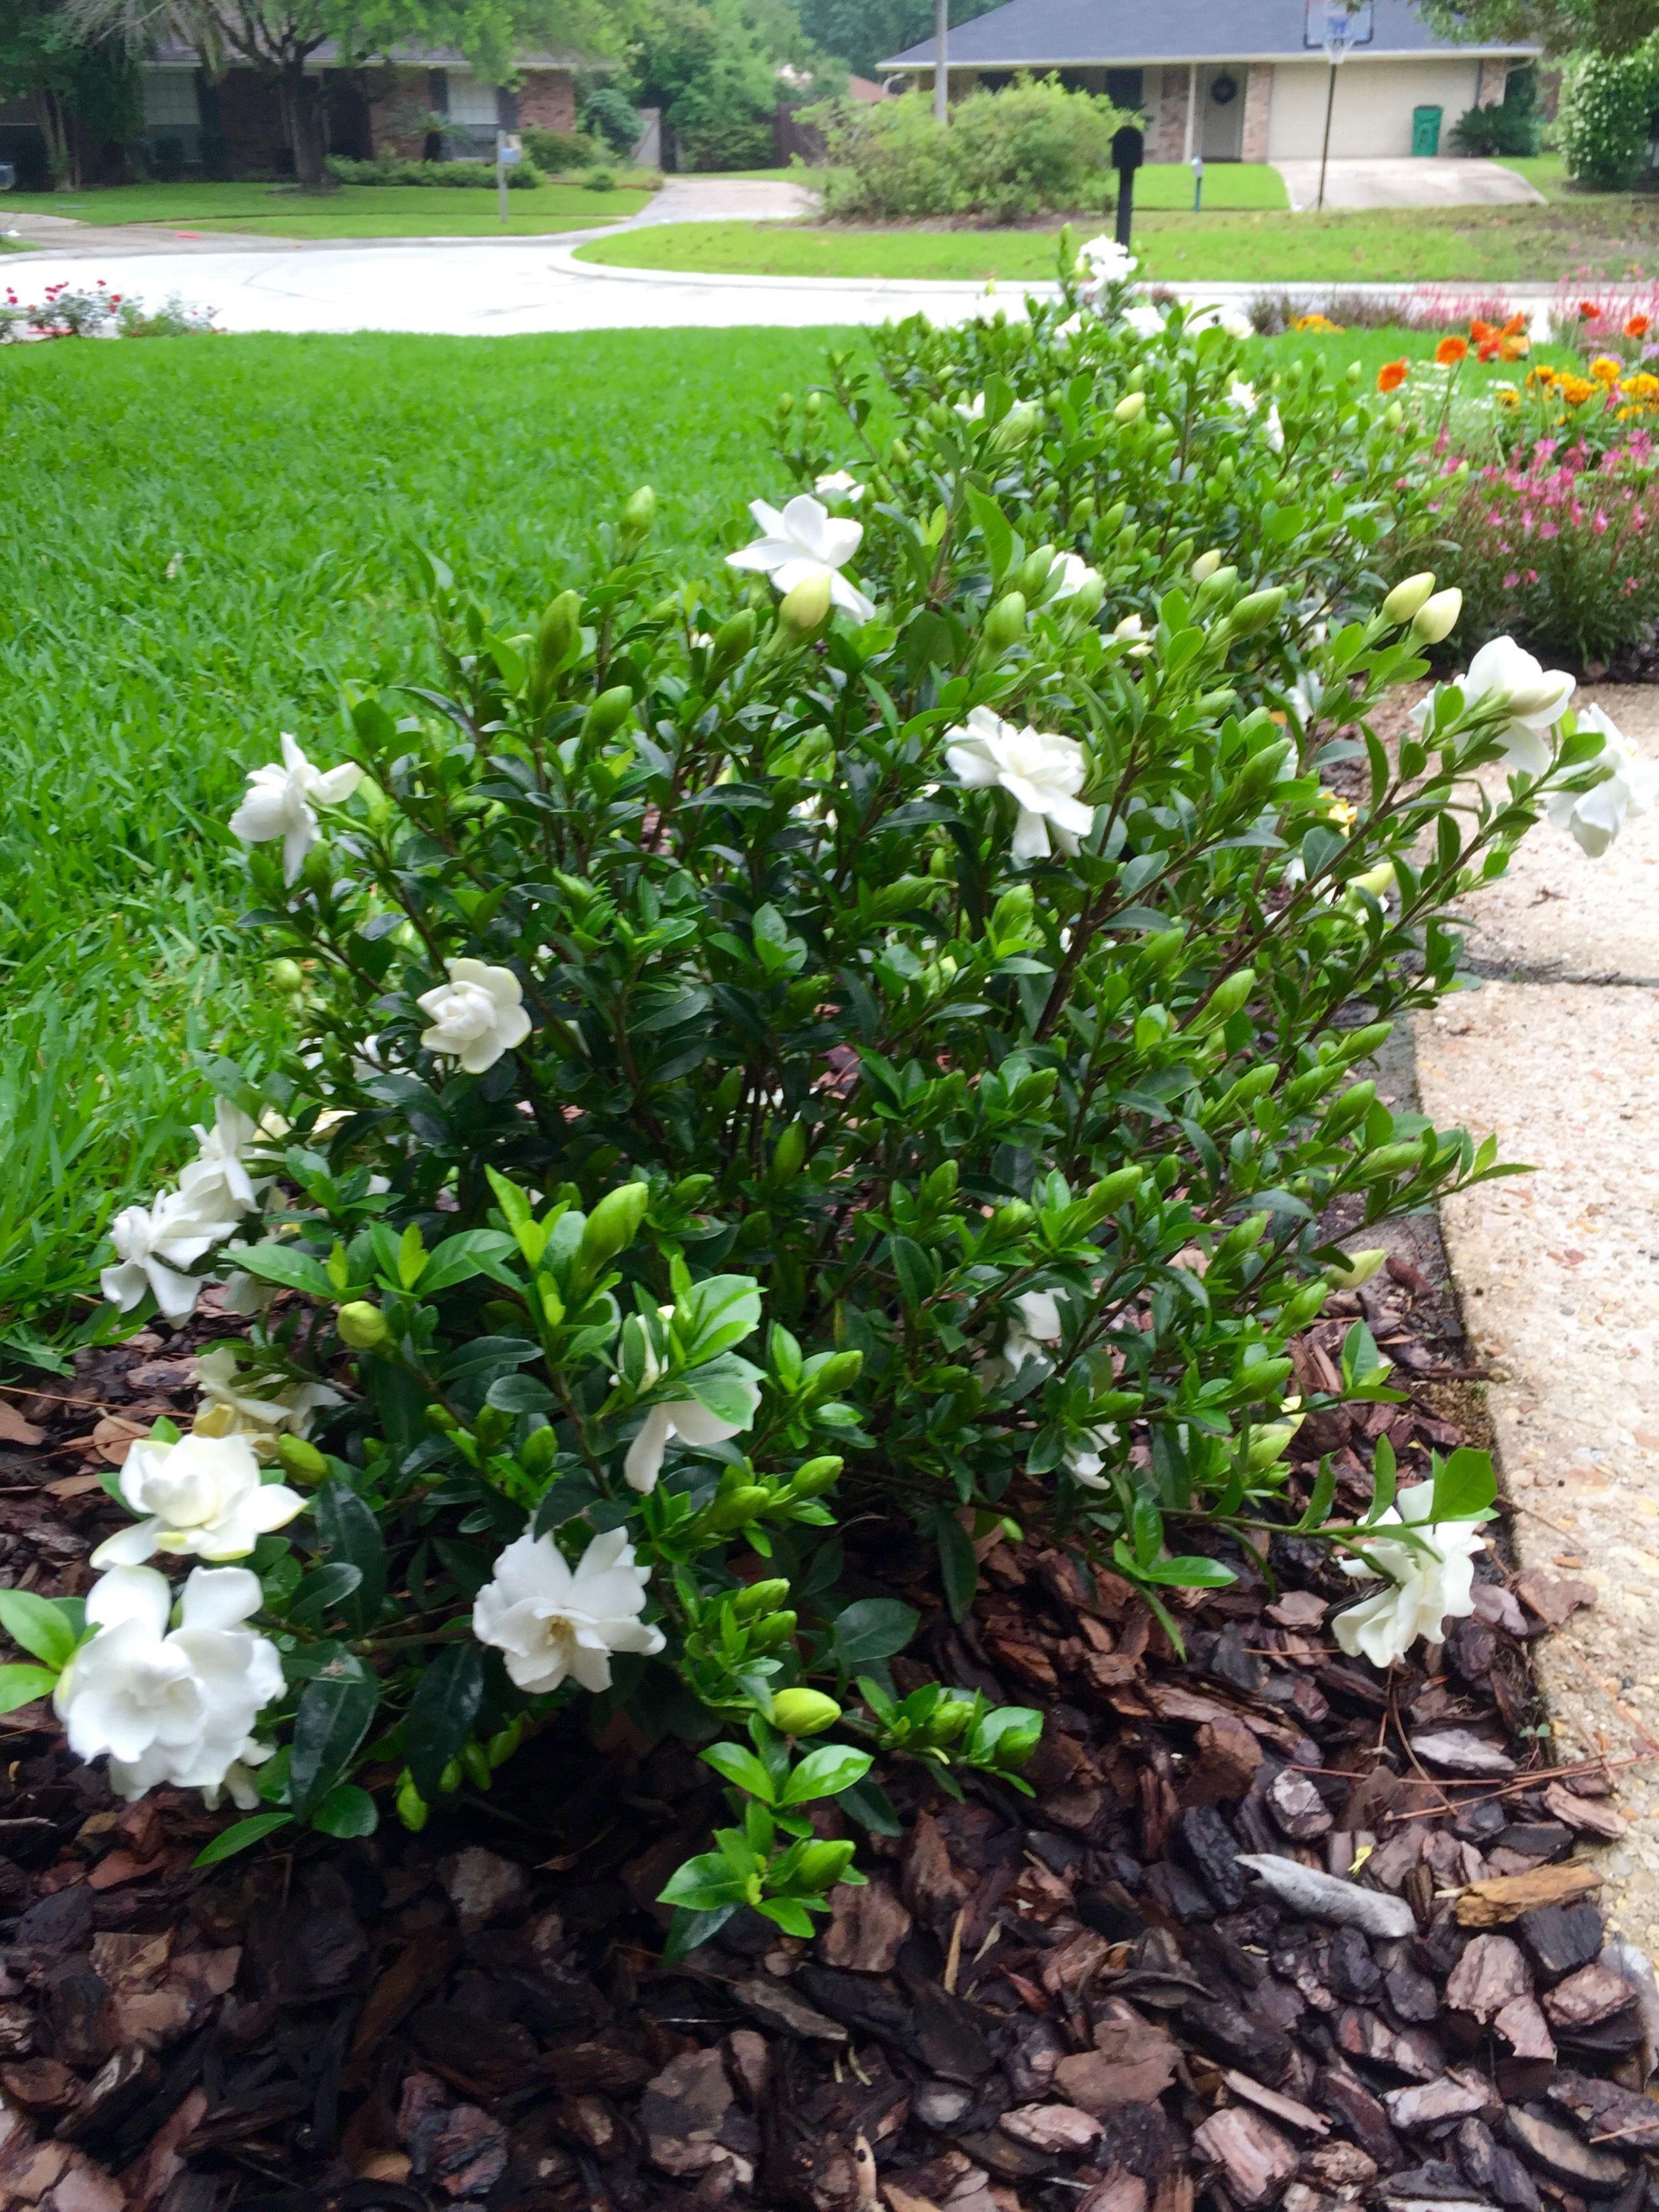 Jubilation Gardenia | Gardening | Pinterest | Garden ...